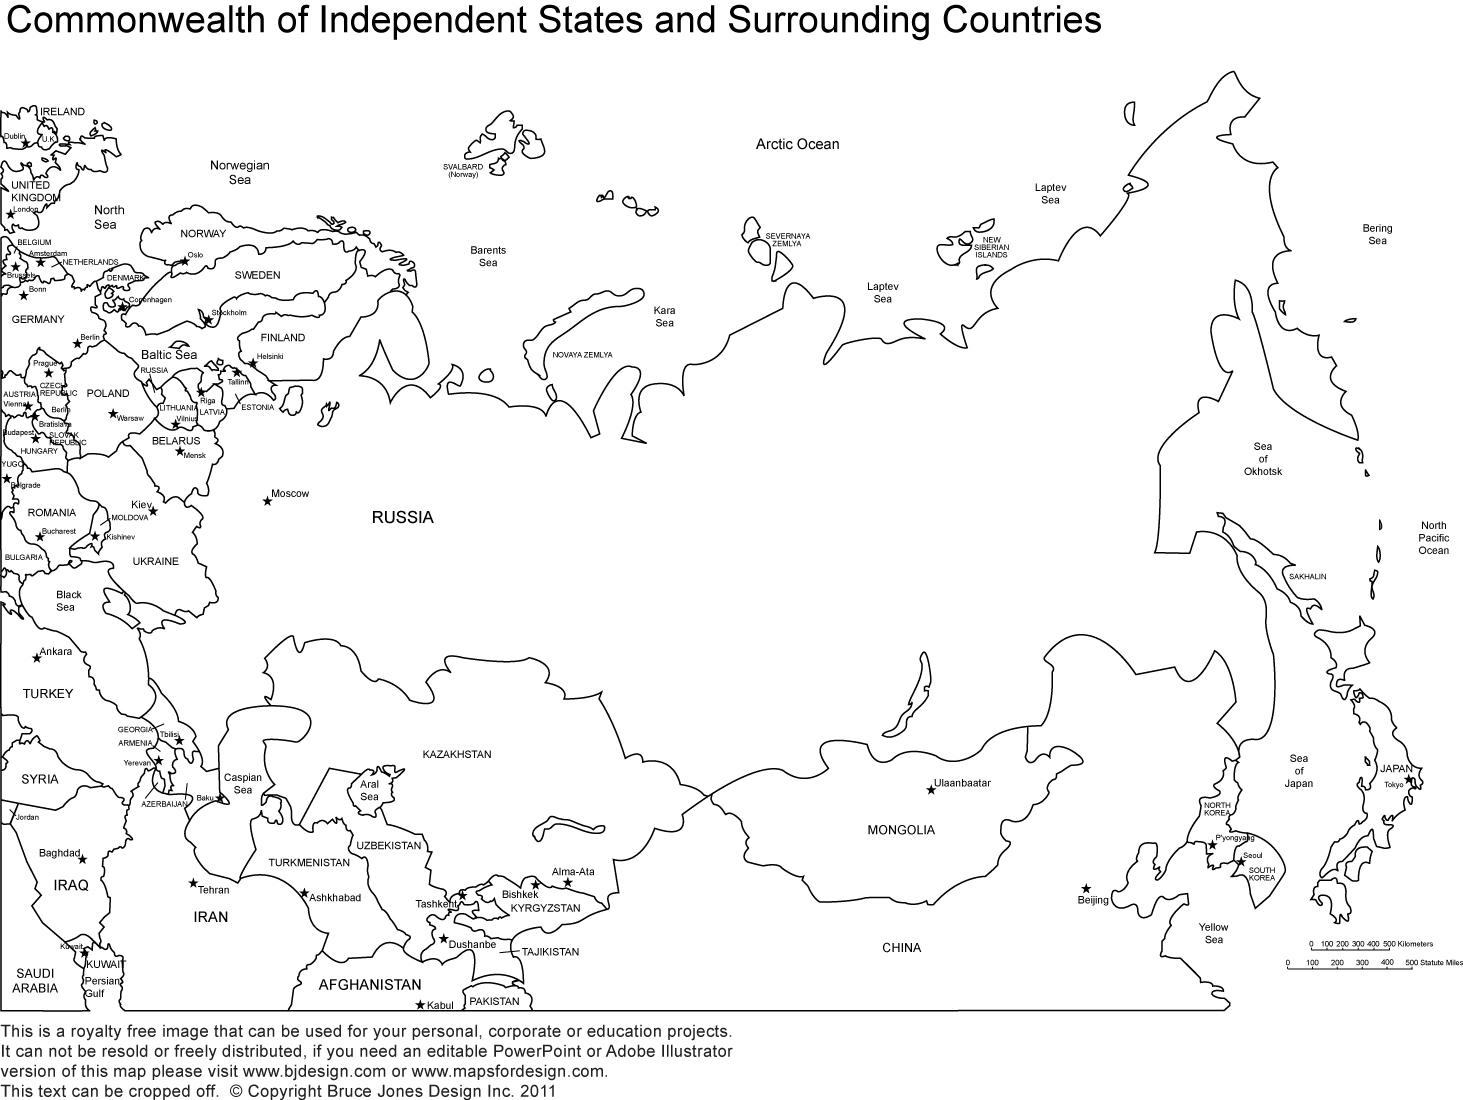 World Regional Printable, Blank Maps • Royalty Free, Jpg - Free Printable Map Of Russia